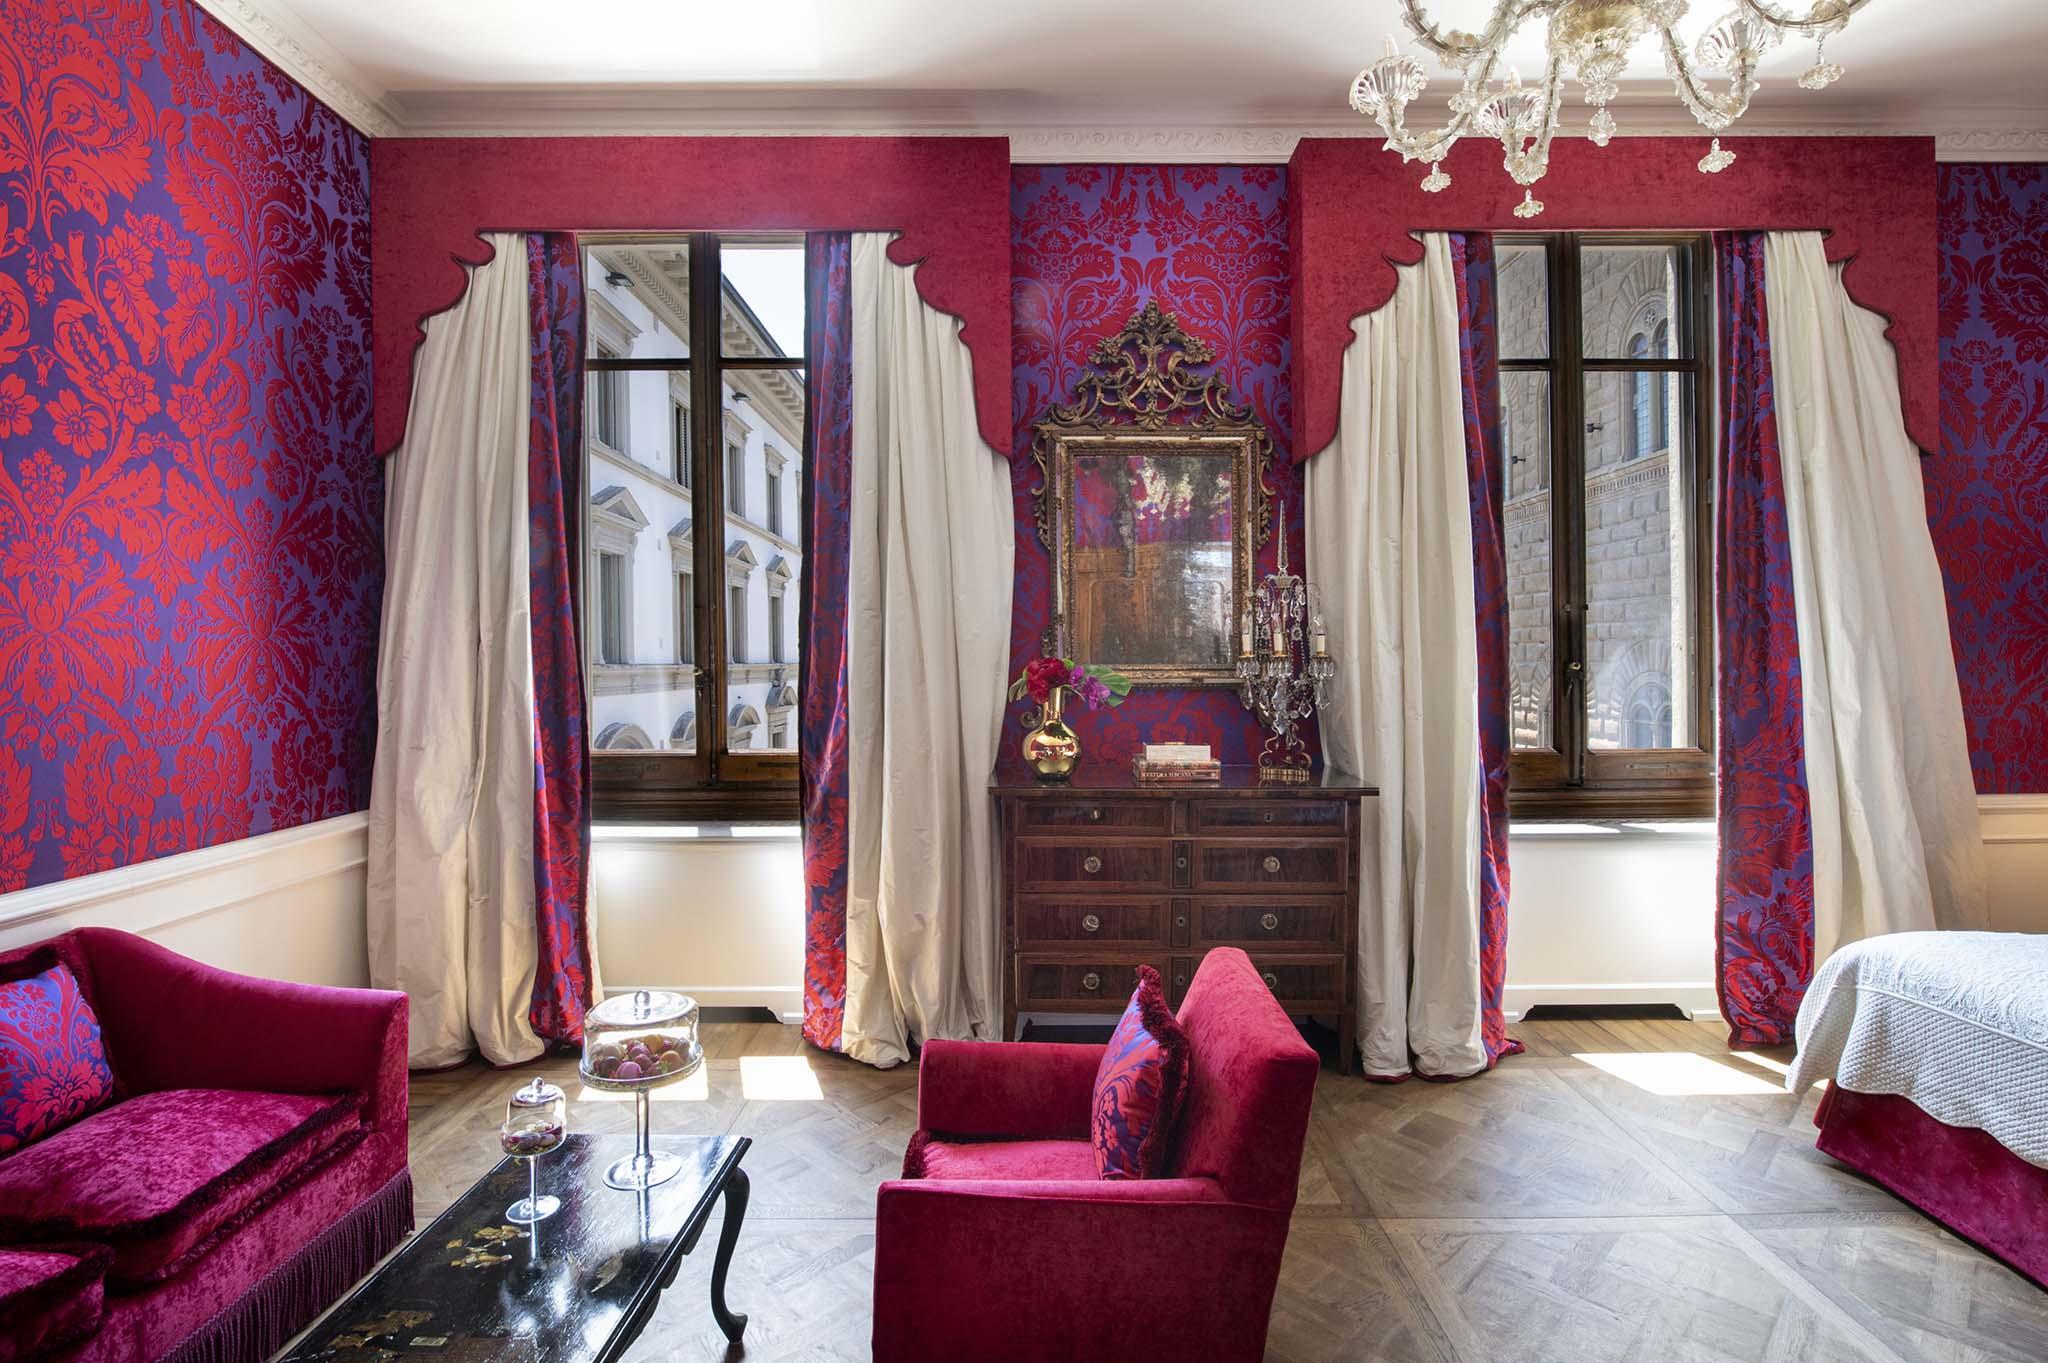 Starhotels Helvetia & Bristol in Florence: Junior Suite